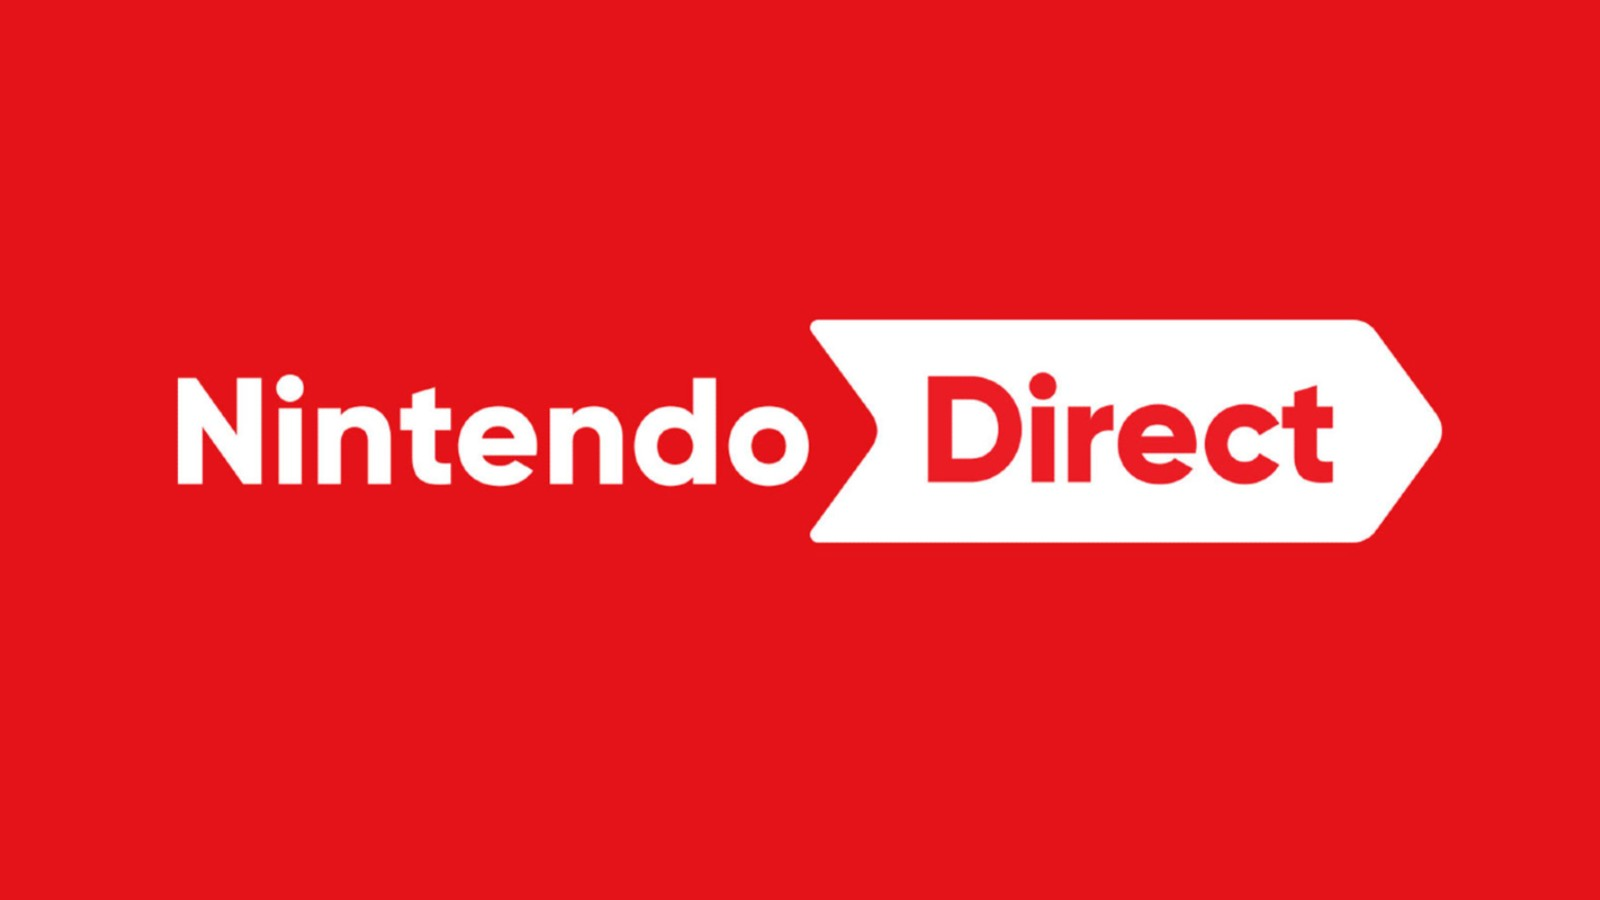 Nintendo Direct event